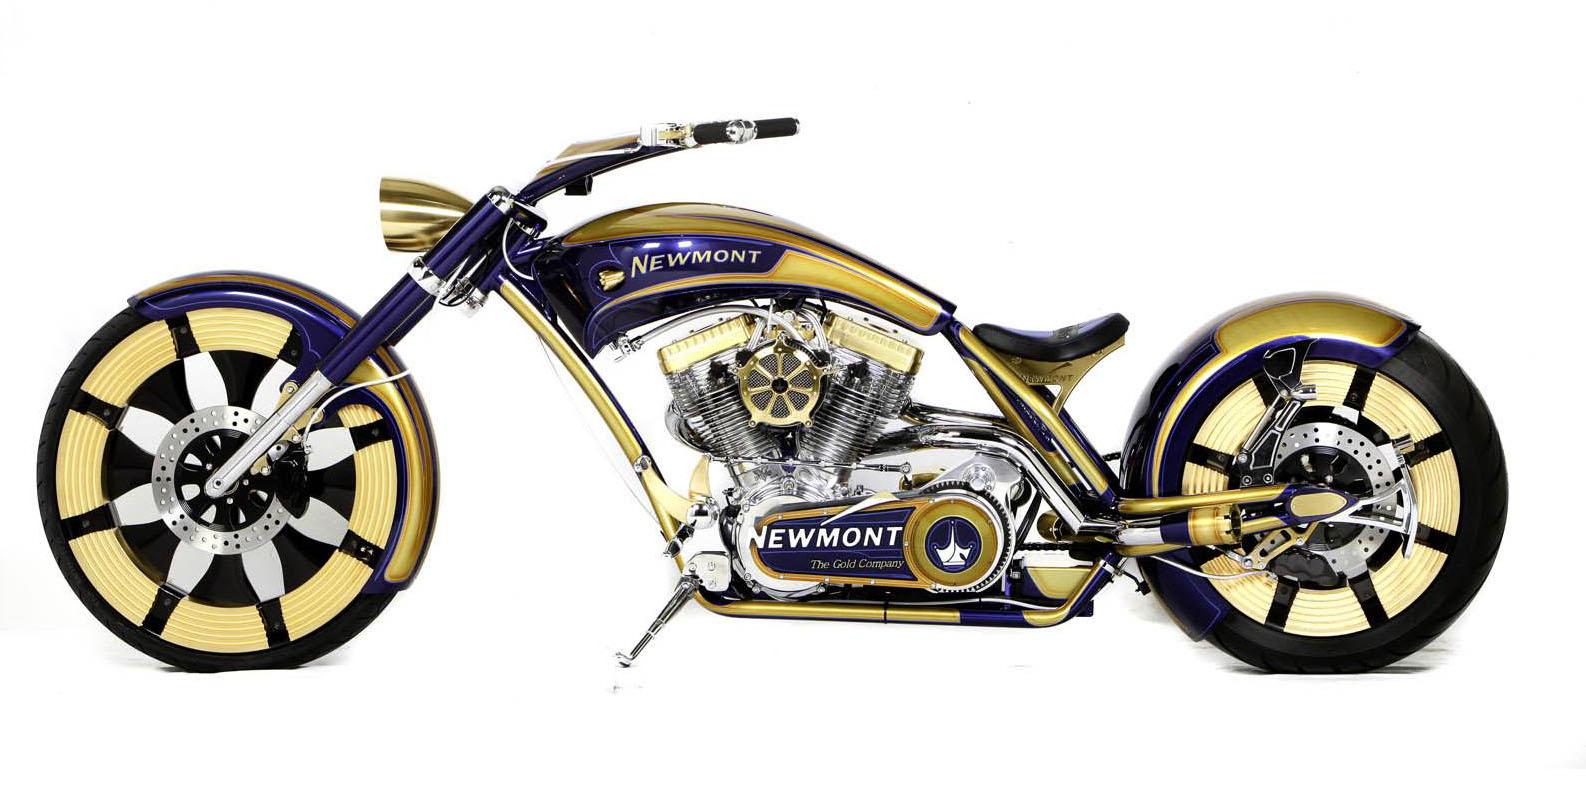 paul-jr-designs-newmont-bike-031-1-e1518561340664